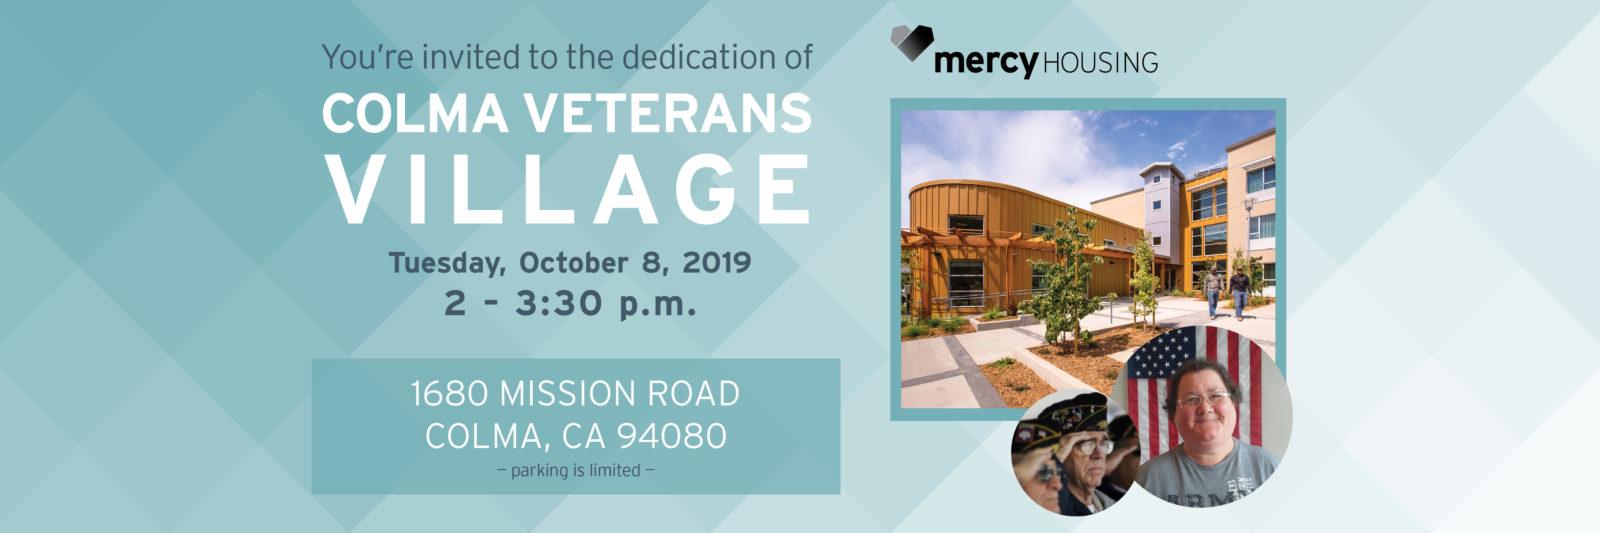 Colma Veterans Village Dedication